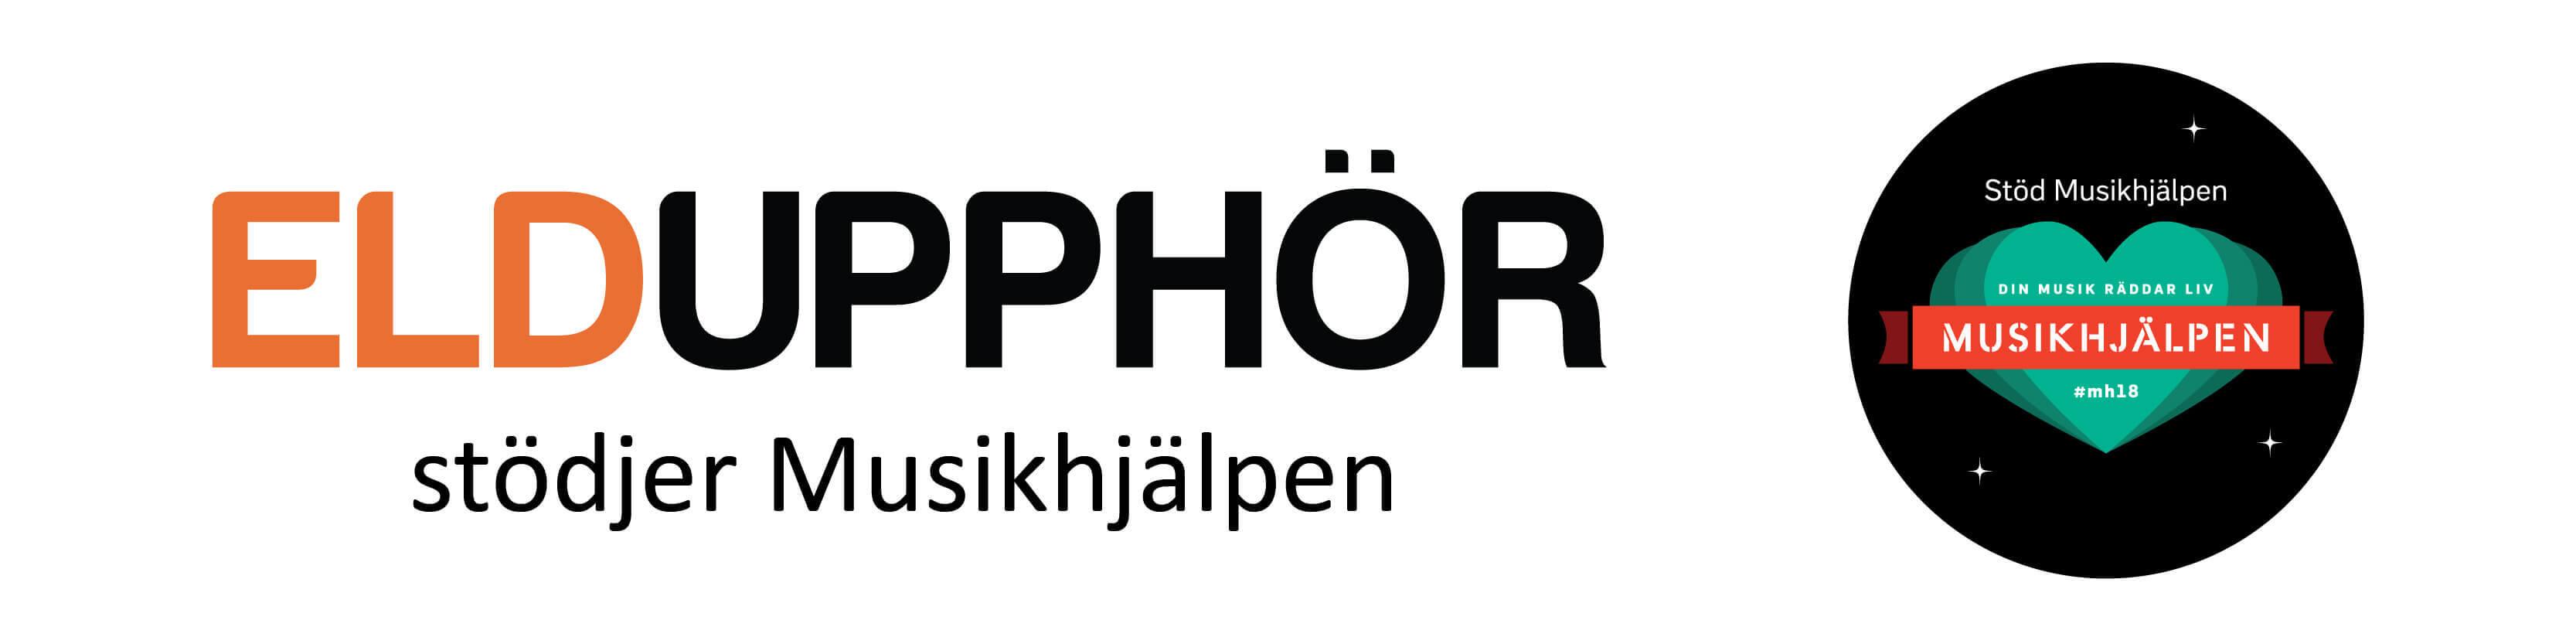 Eldupphör Musikhjälpen 2018